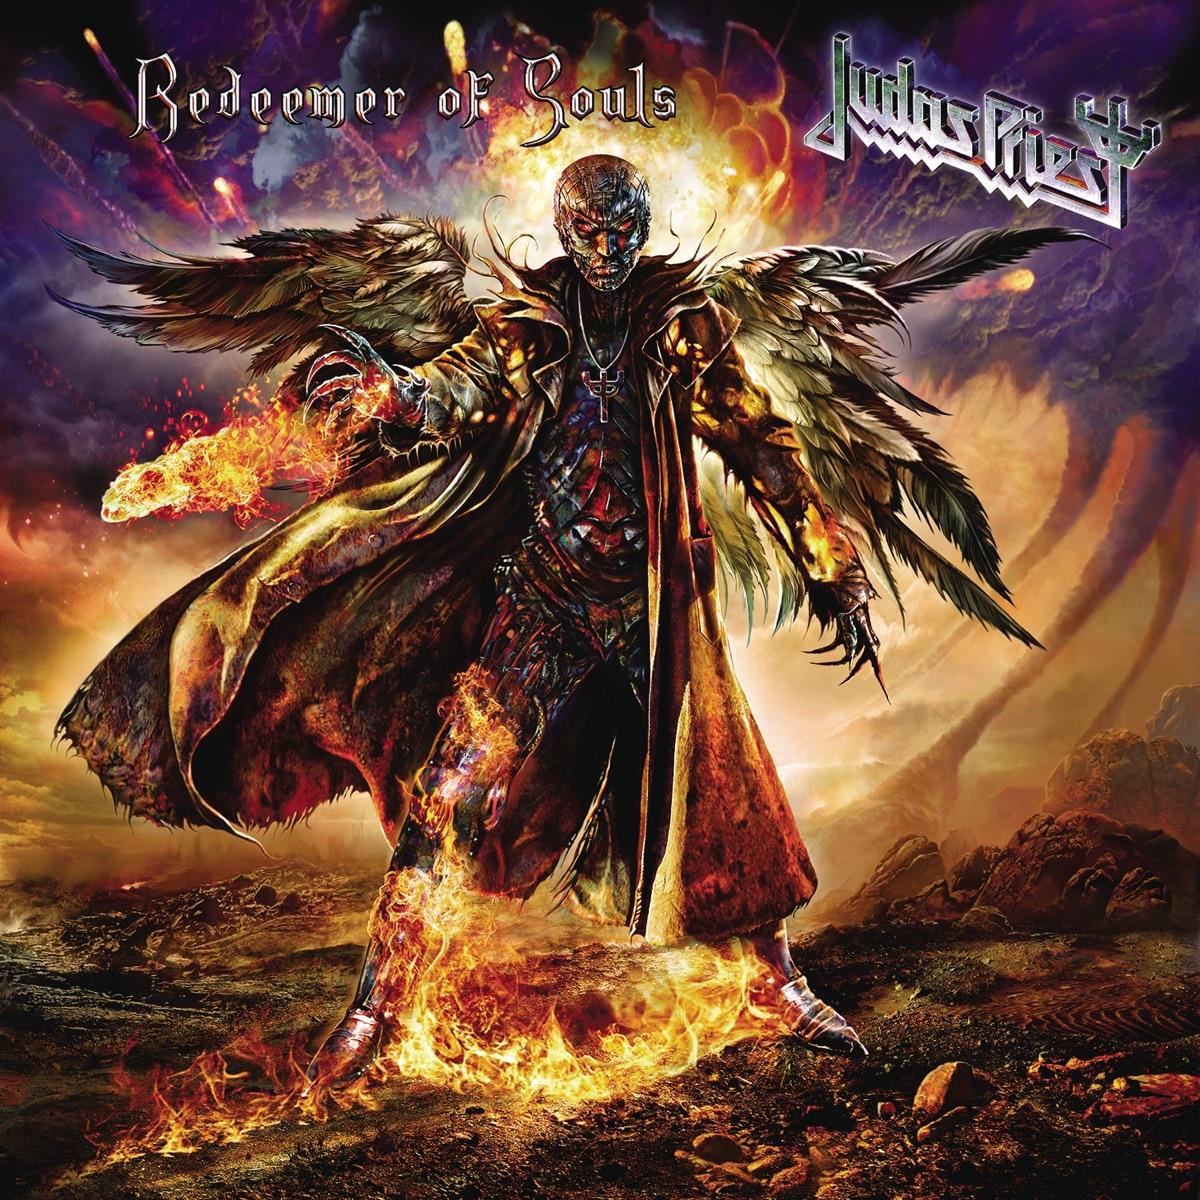 Redeemer of Souls Deluxe Version Judas Priest CD cover